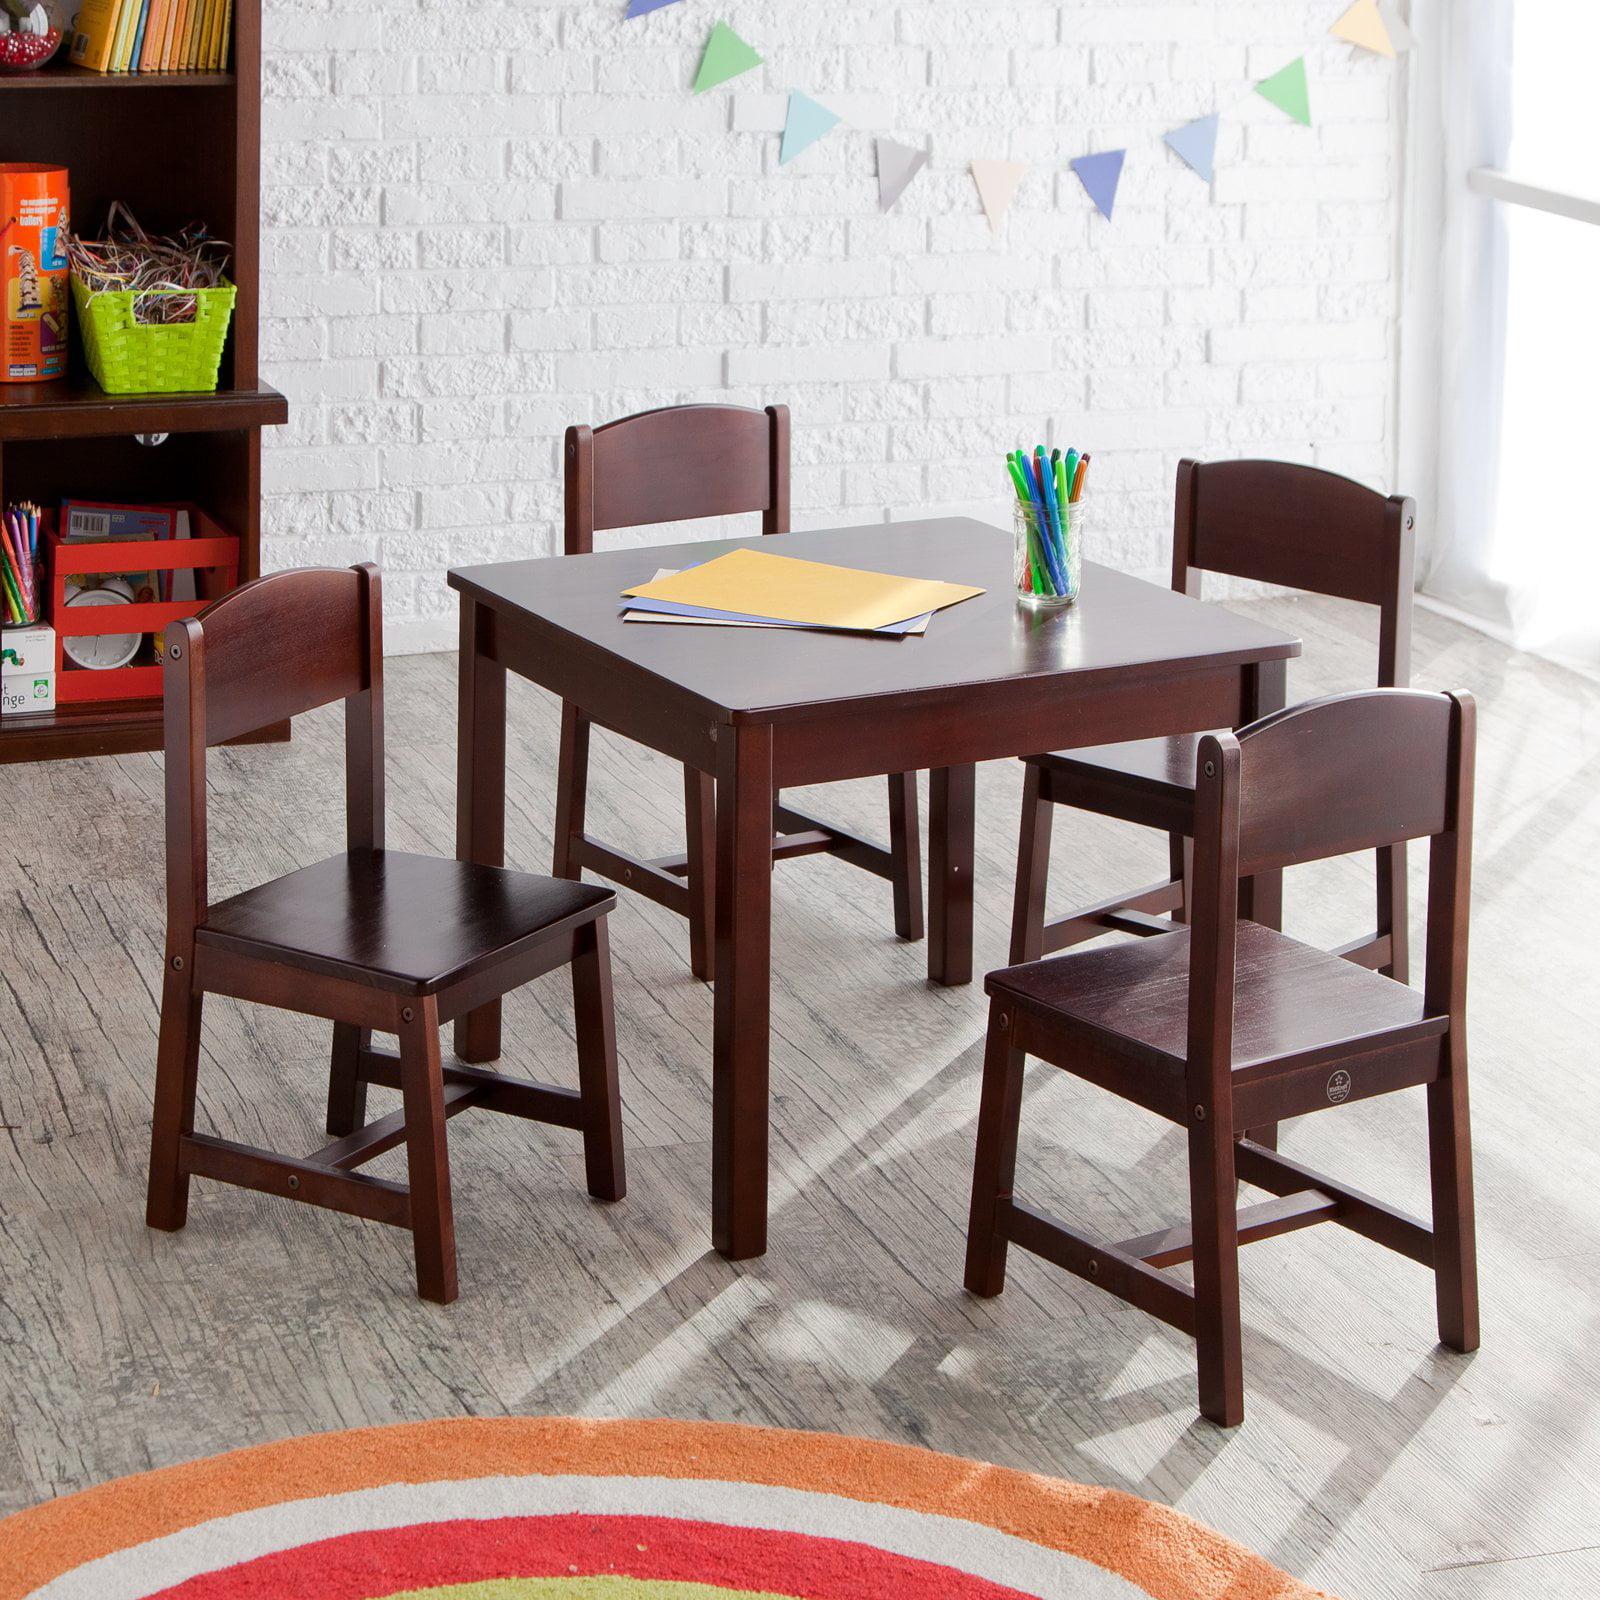 KidKraft Farmhouse Table & 4 Chair Set Espresso Walmart